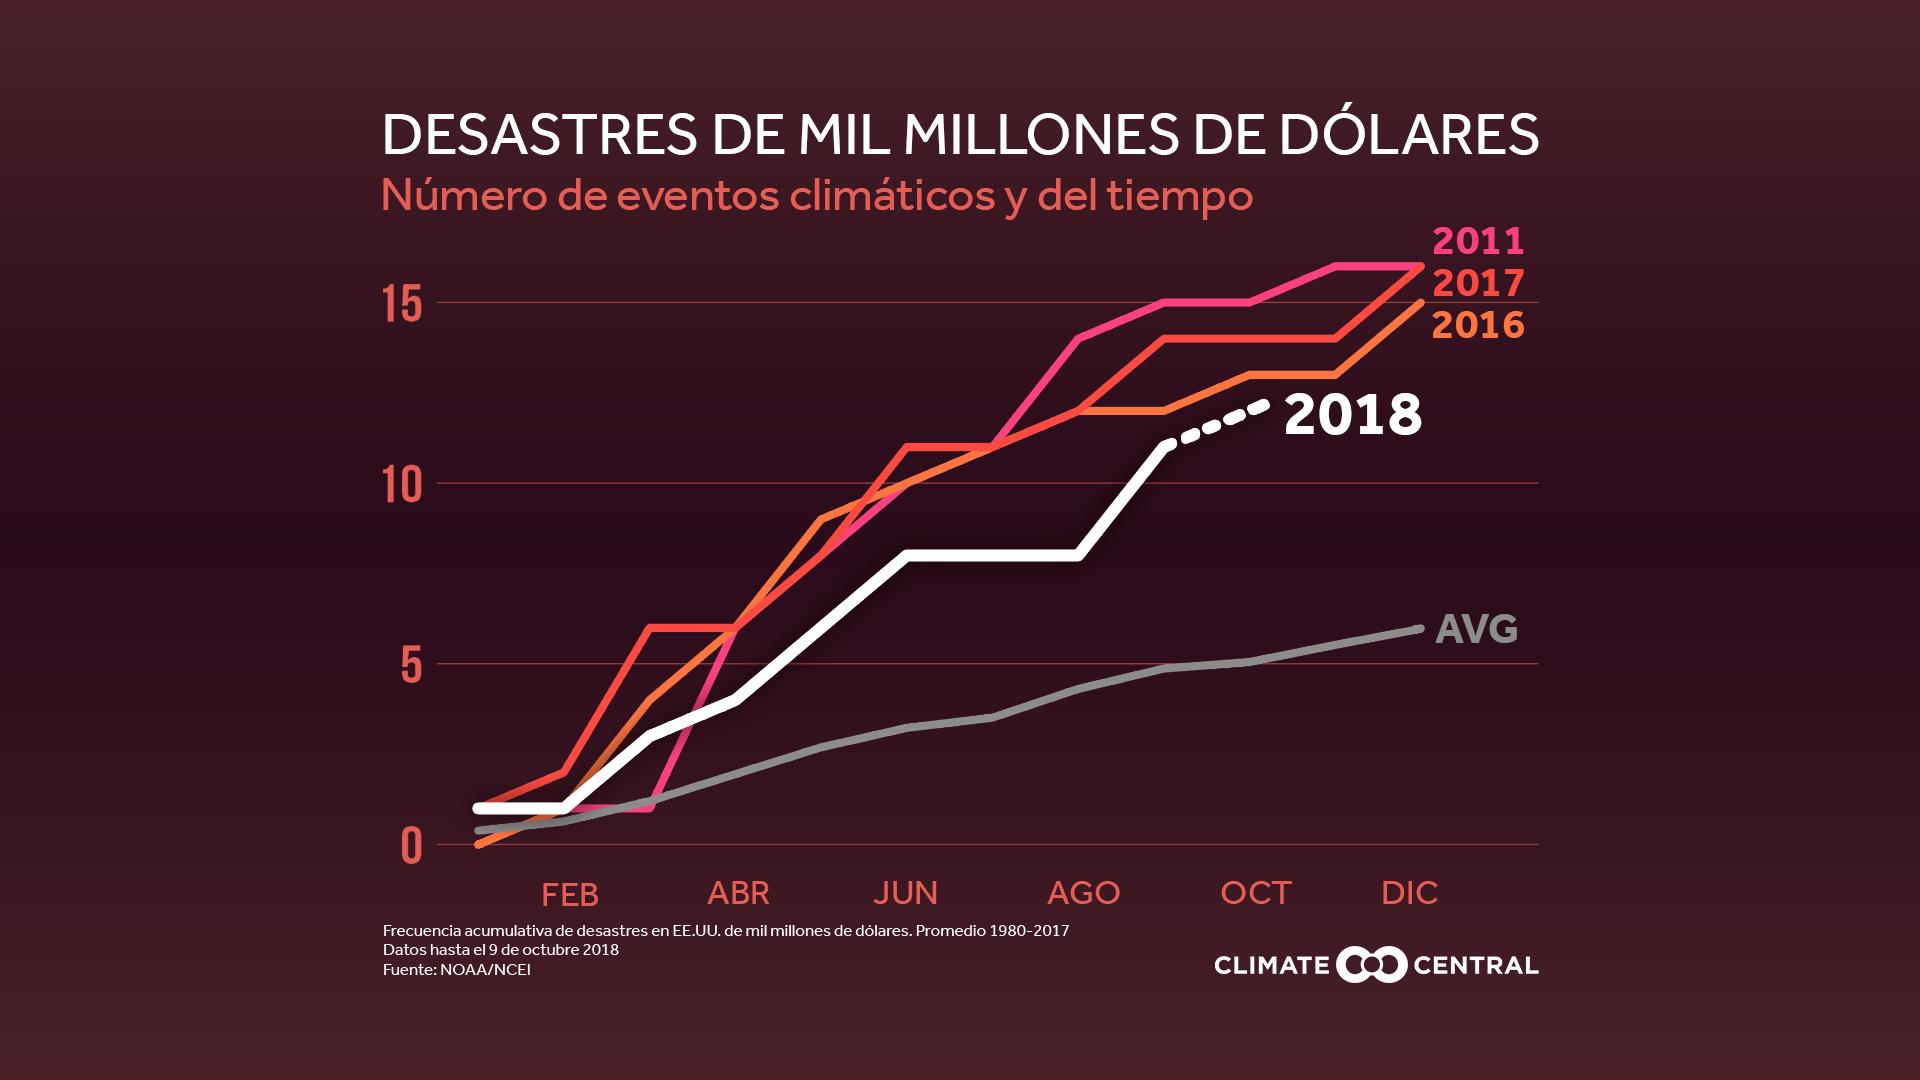 billion dollar disasters - count